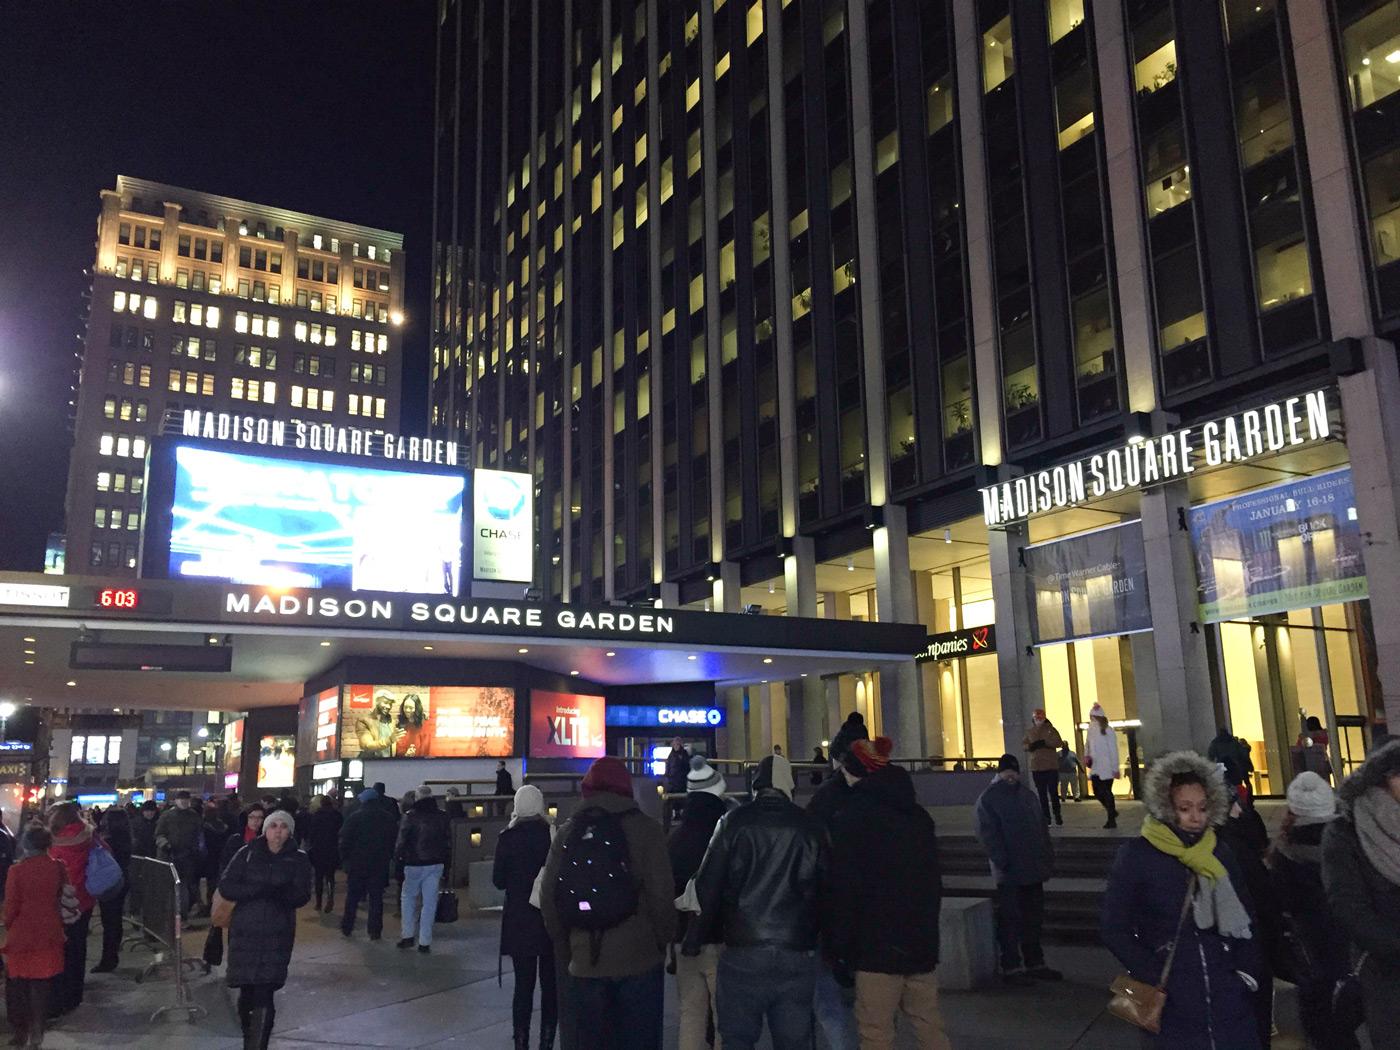 Heading into Madison Square Garden